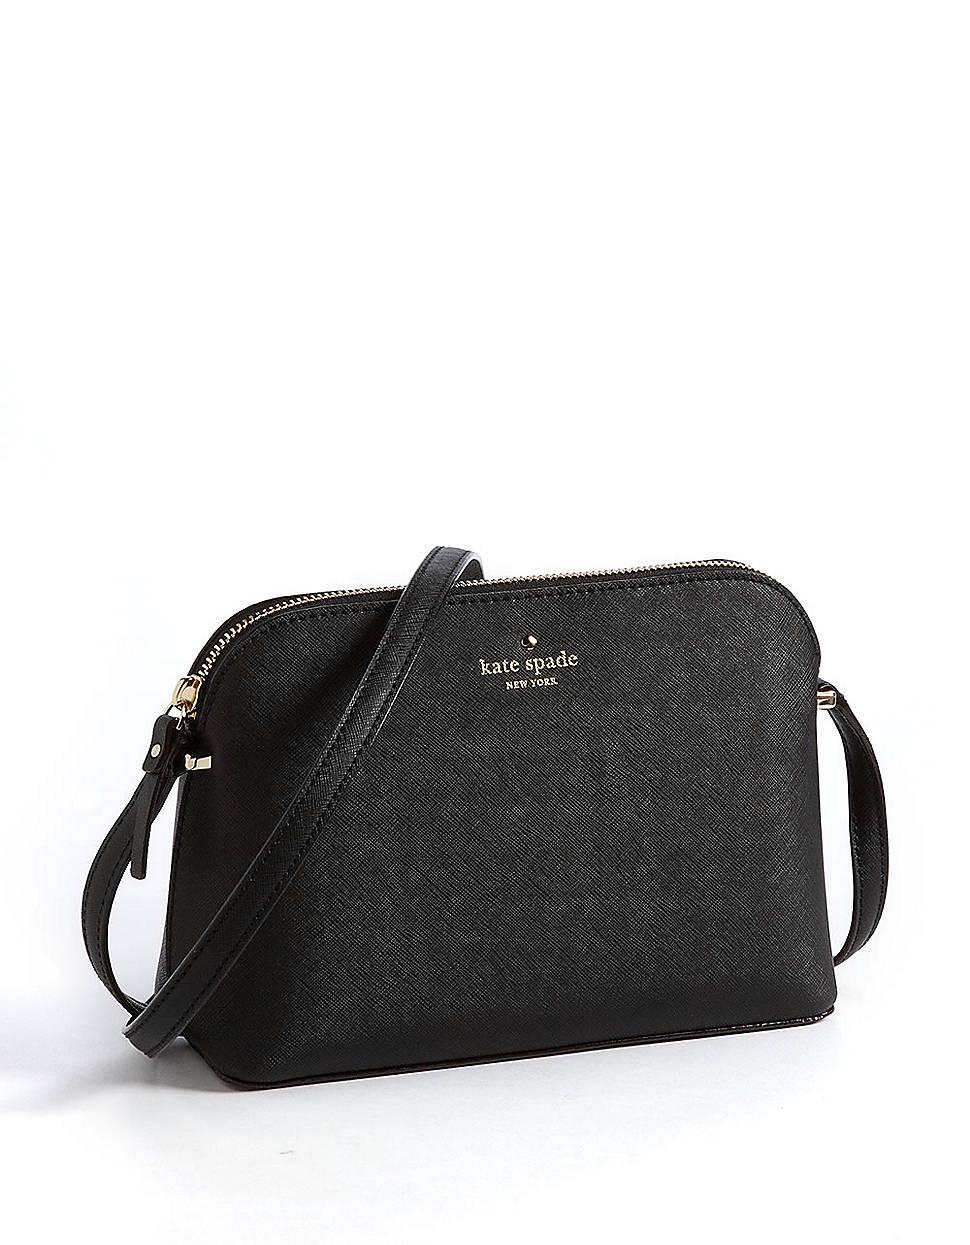 70227465d Kate Spade Cedar Street Mandy Leather Crossbody Bag in Black - Lyst